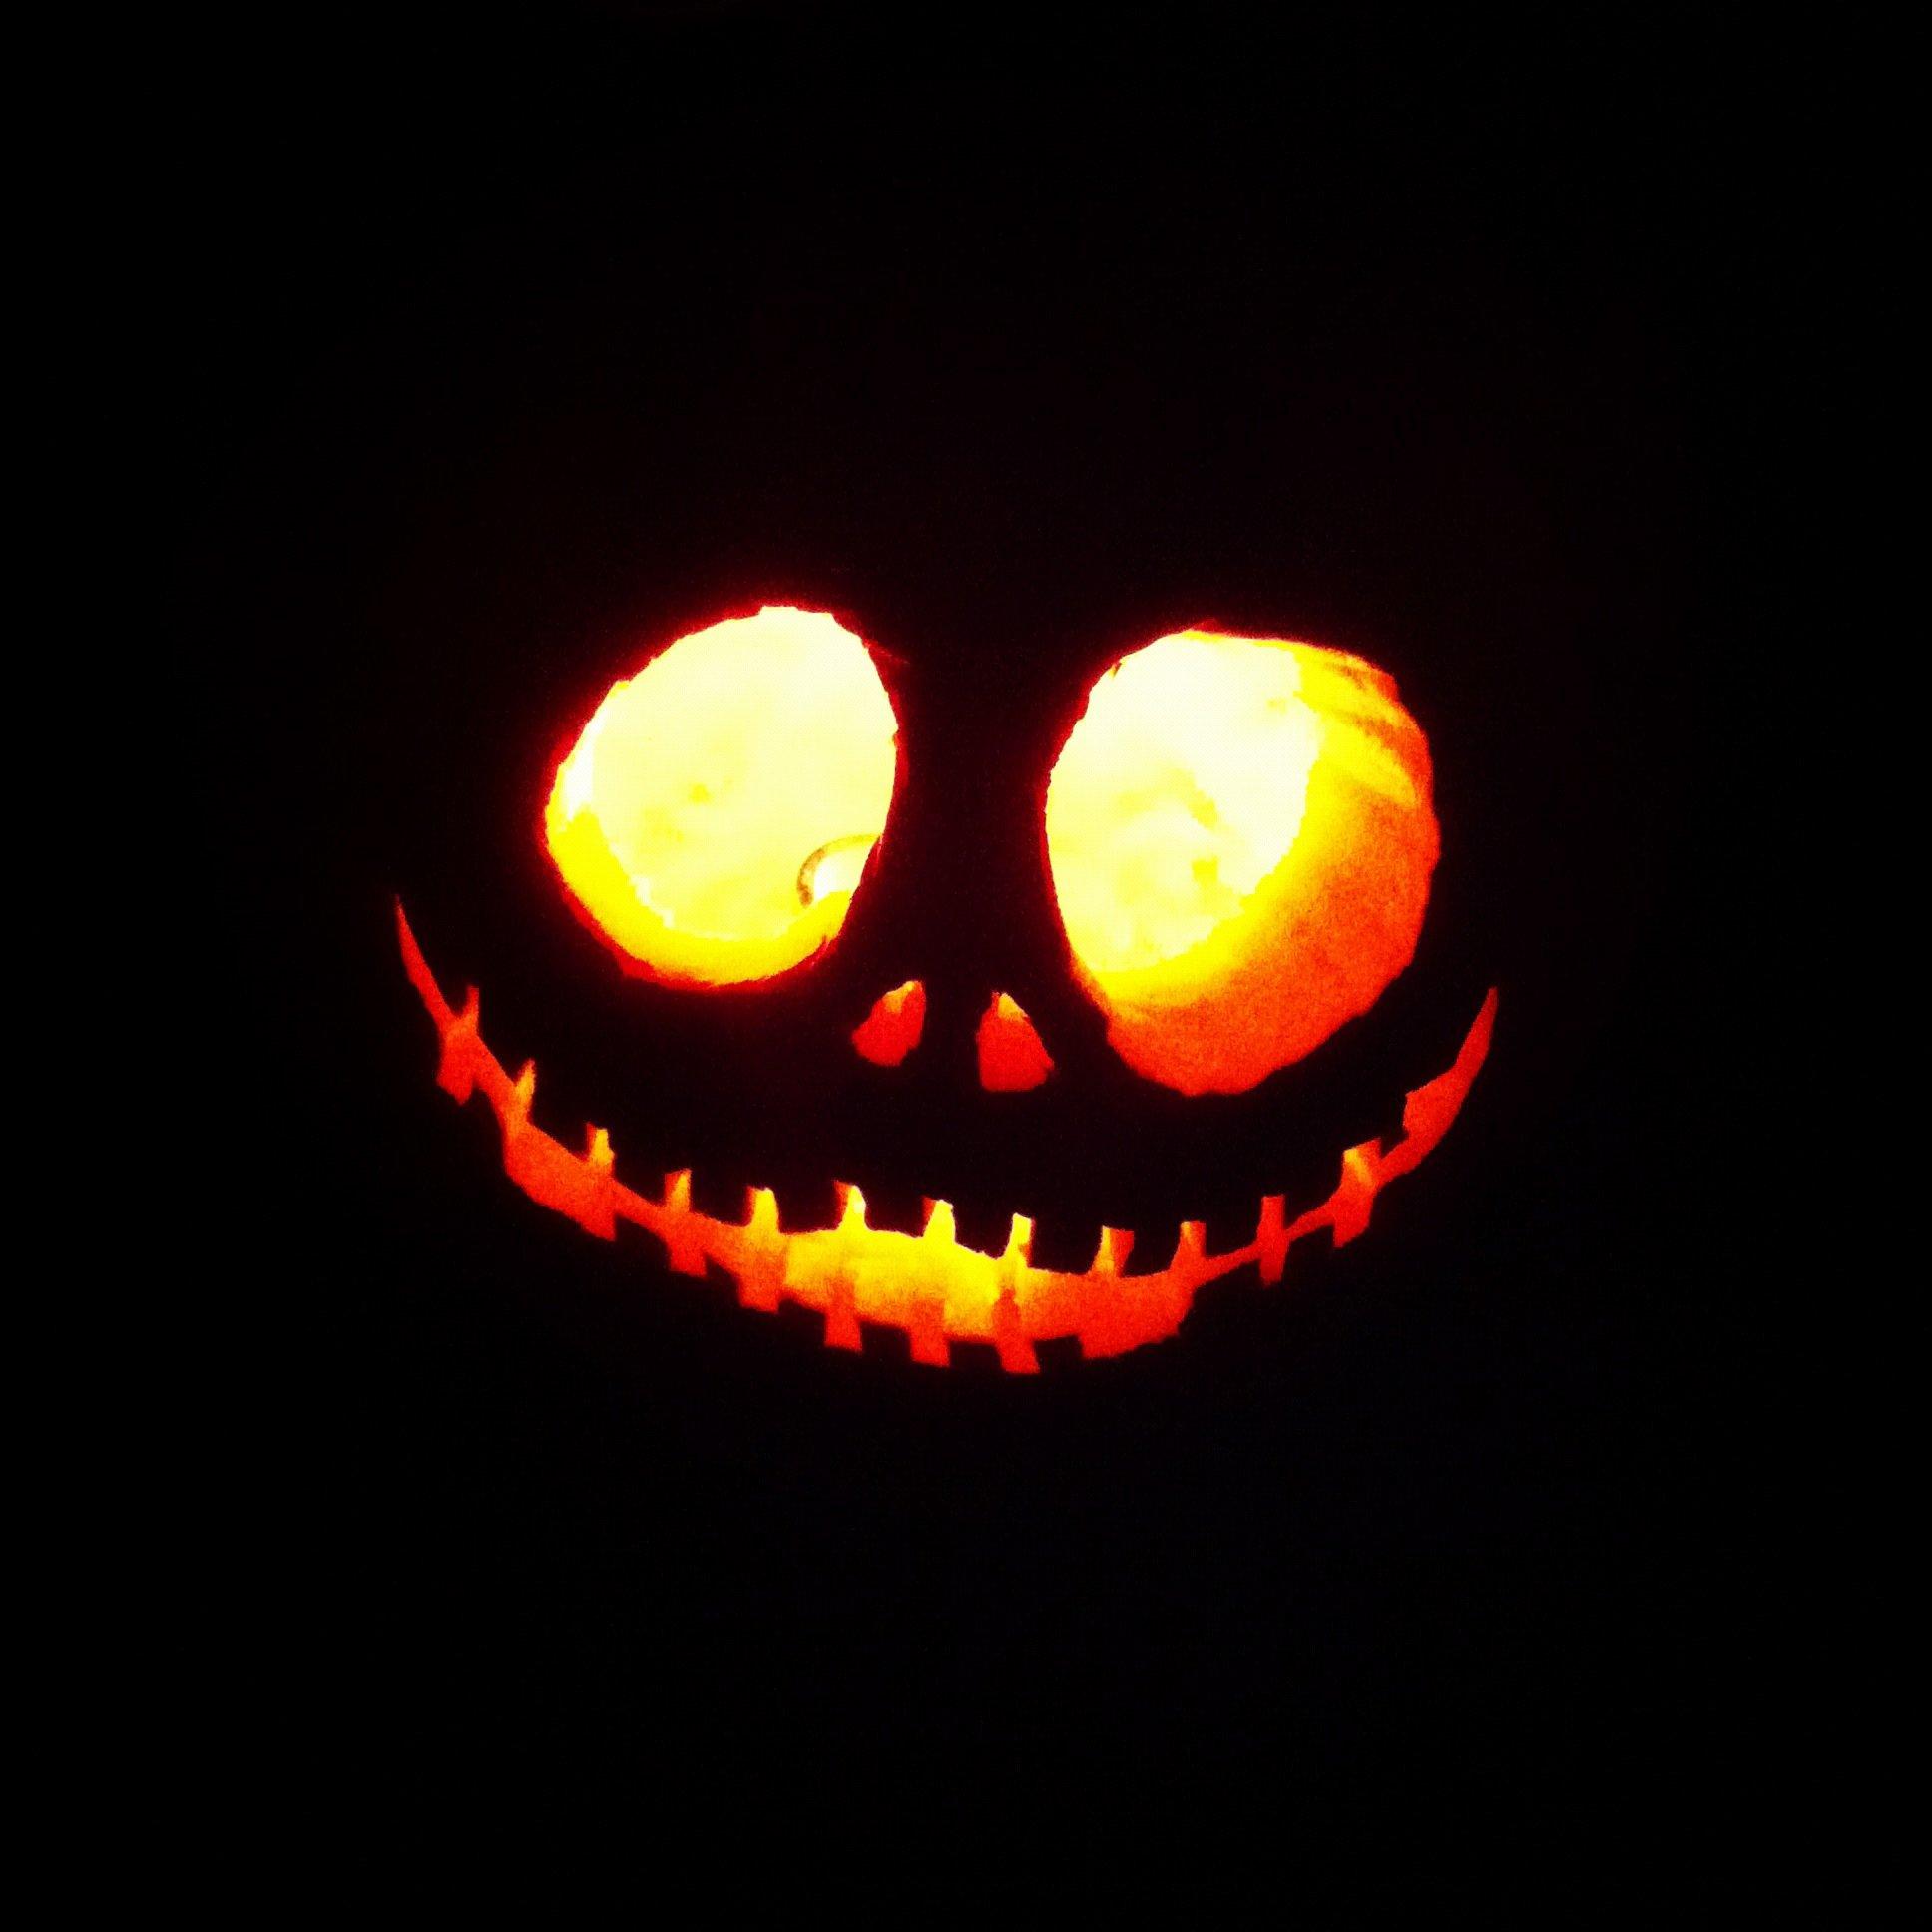 jack o lantern - Nightmare Before Christmas Jack O Lantern